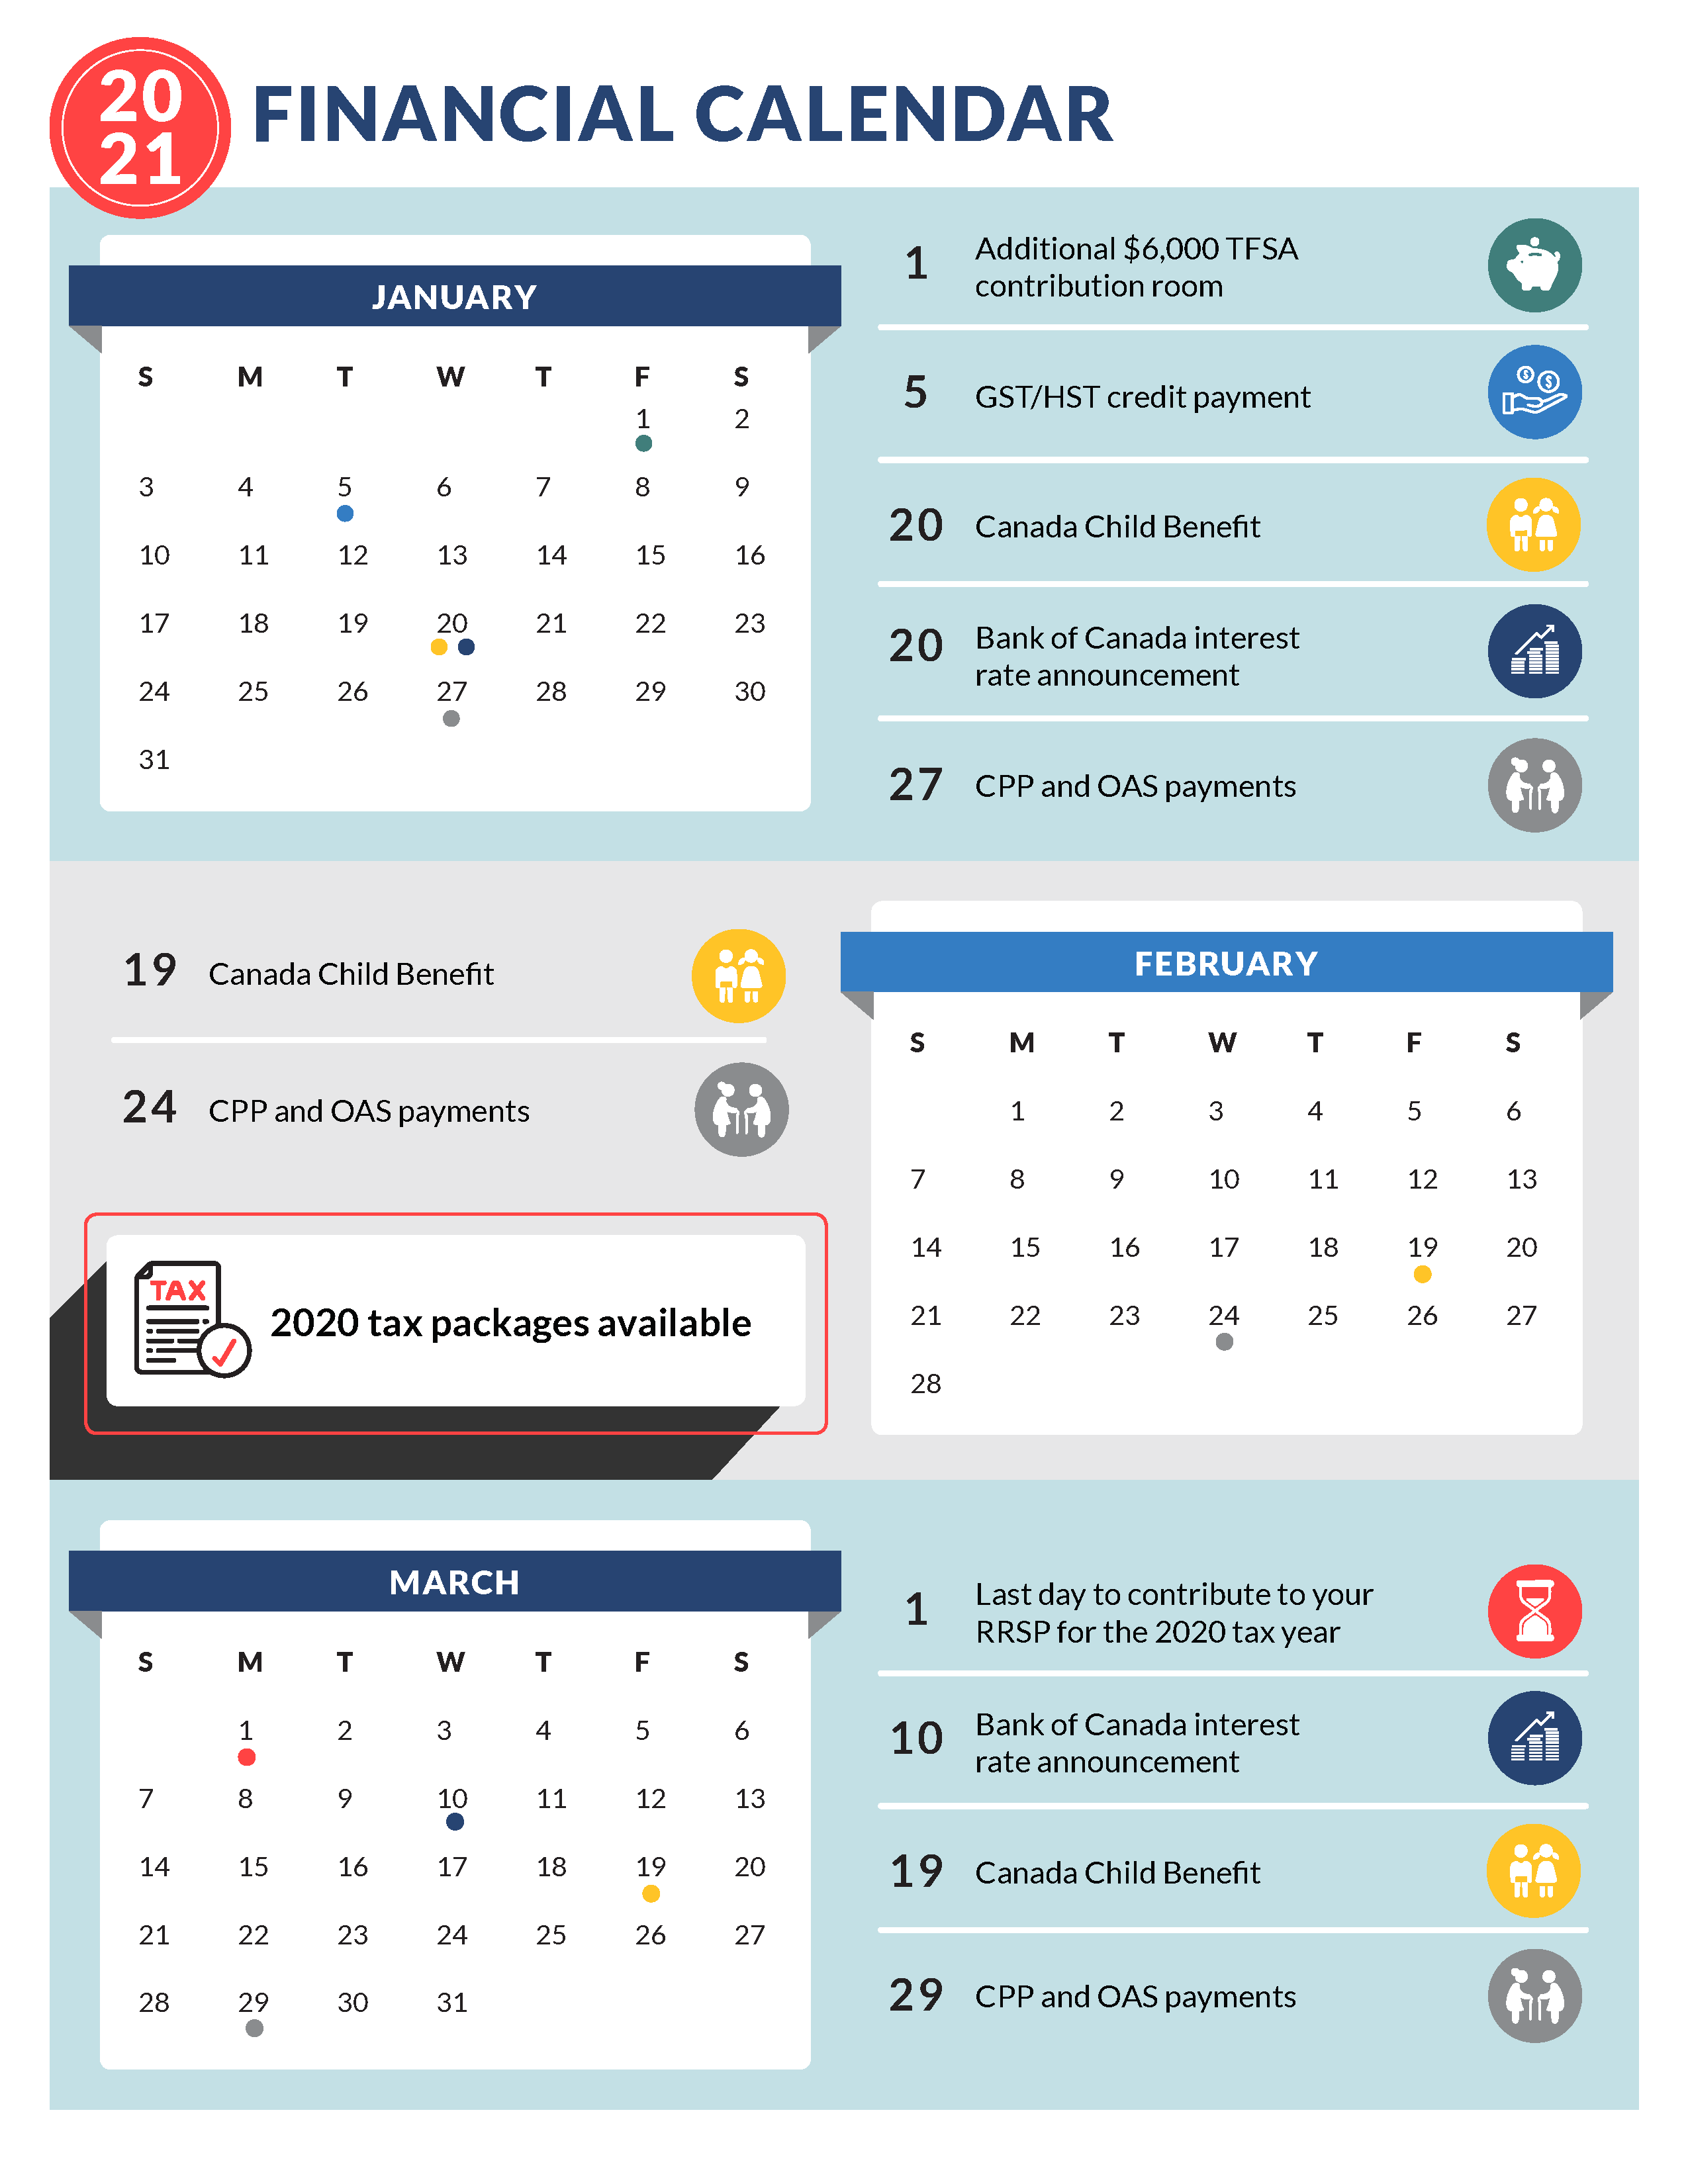 Financial Calendar 2021 Thumbnail